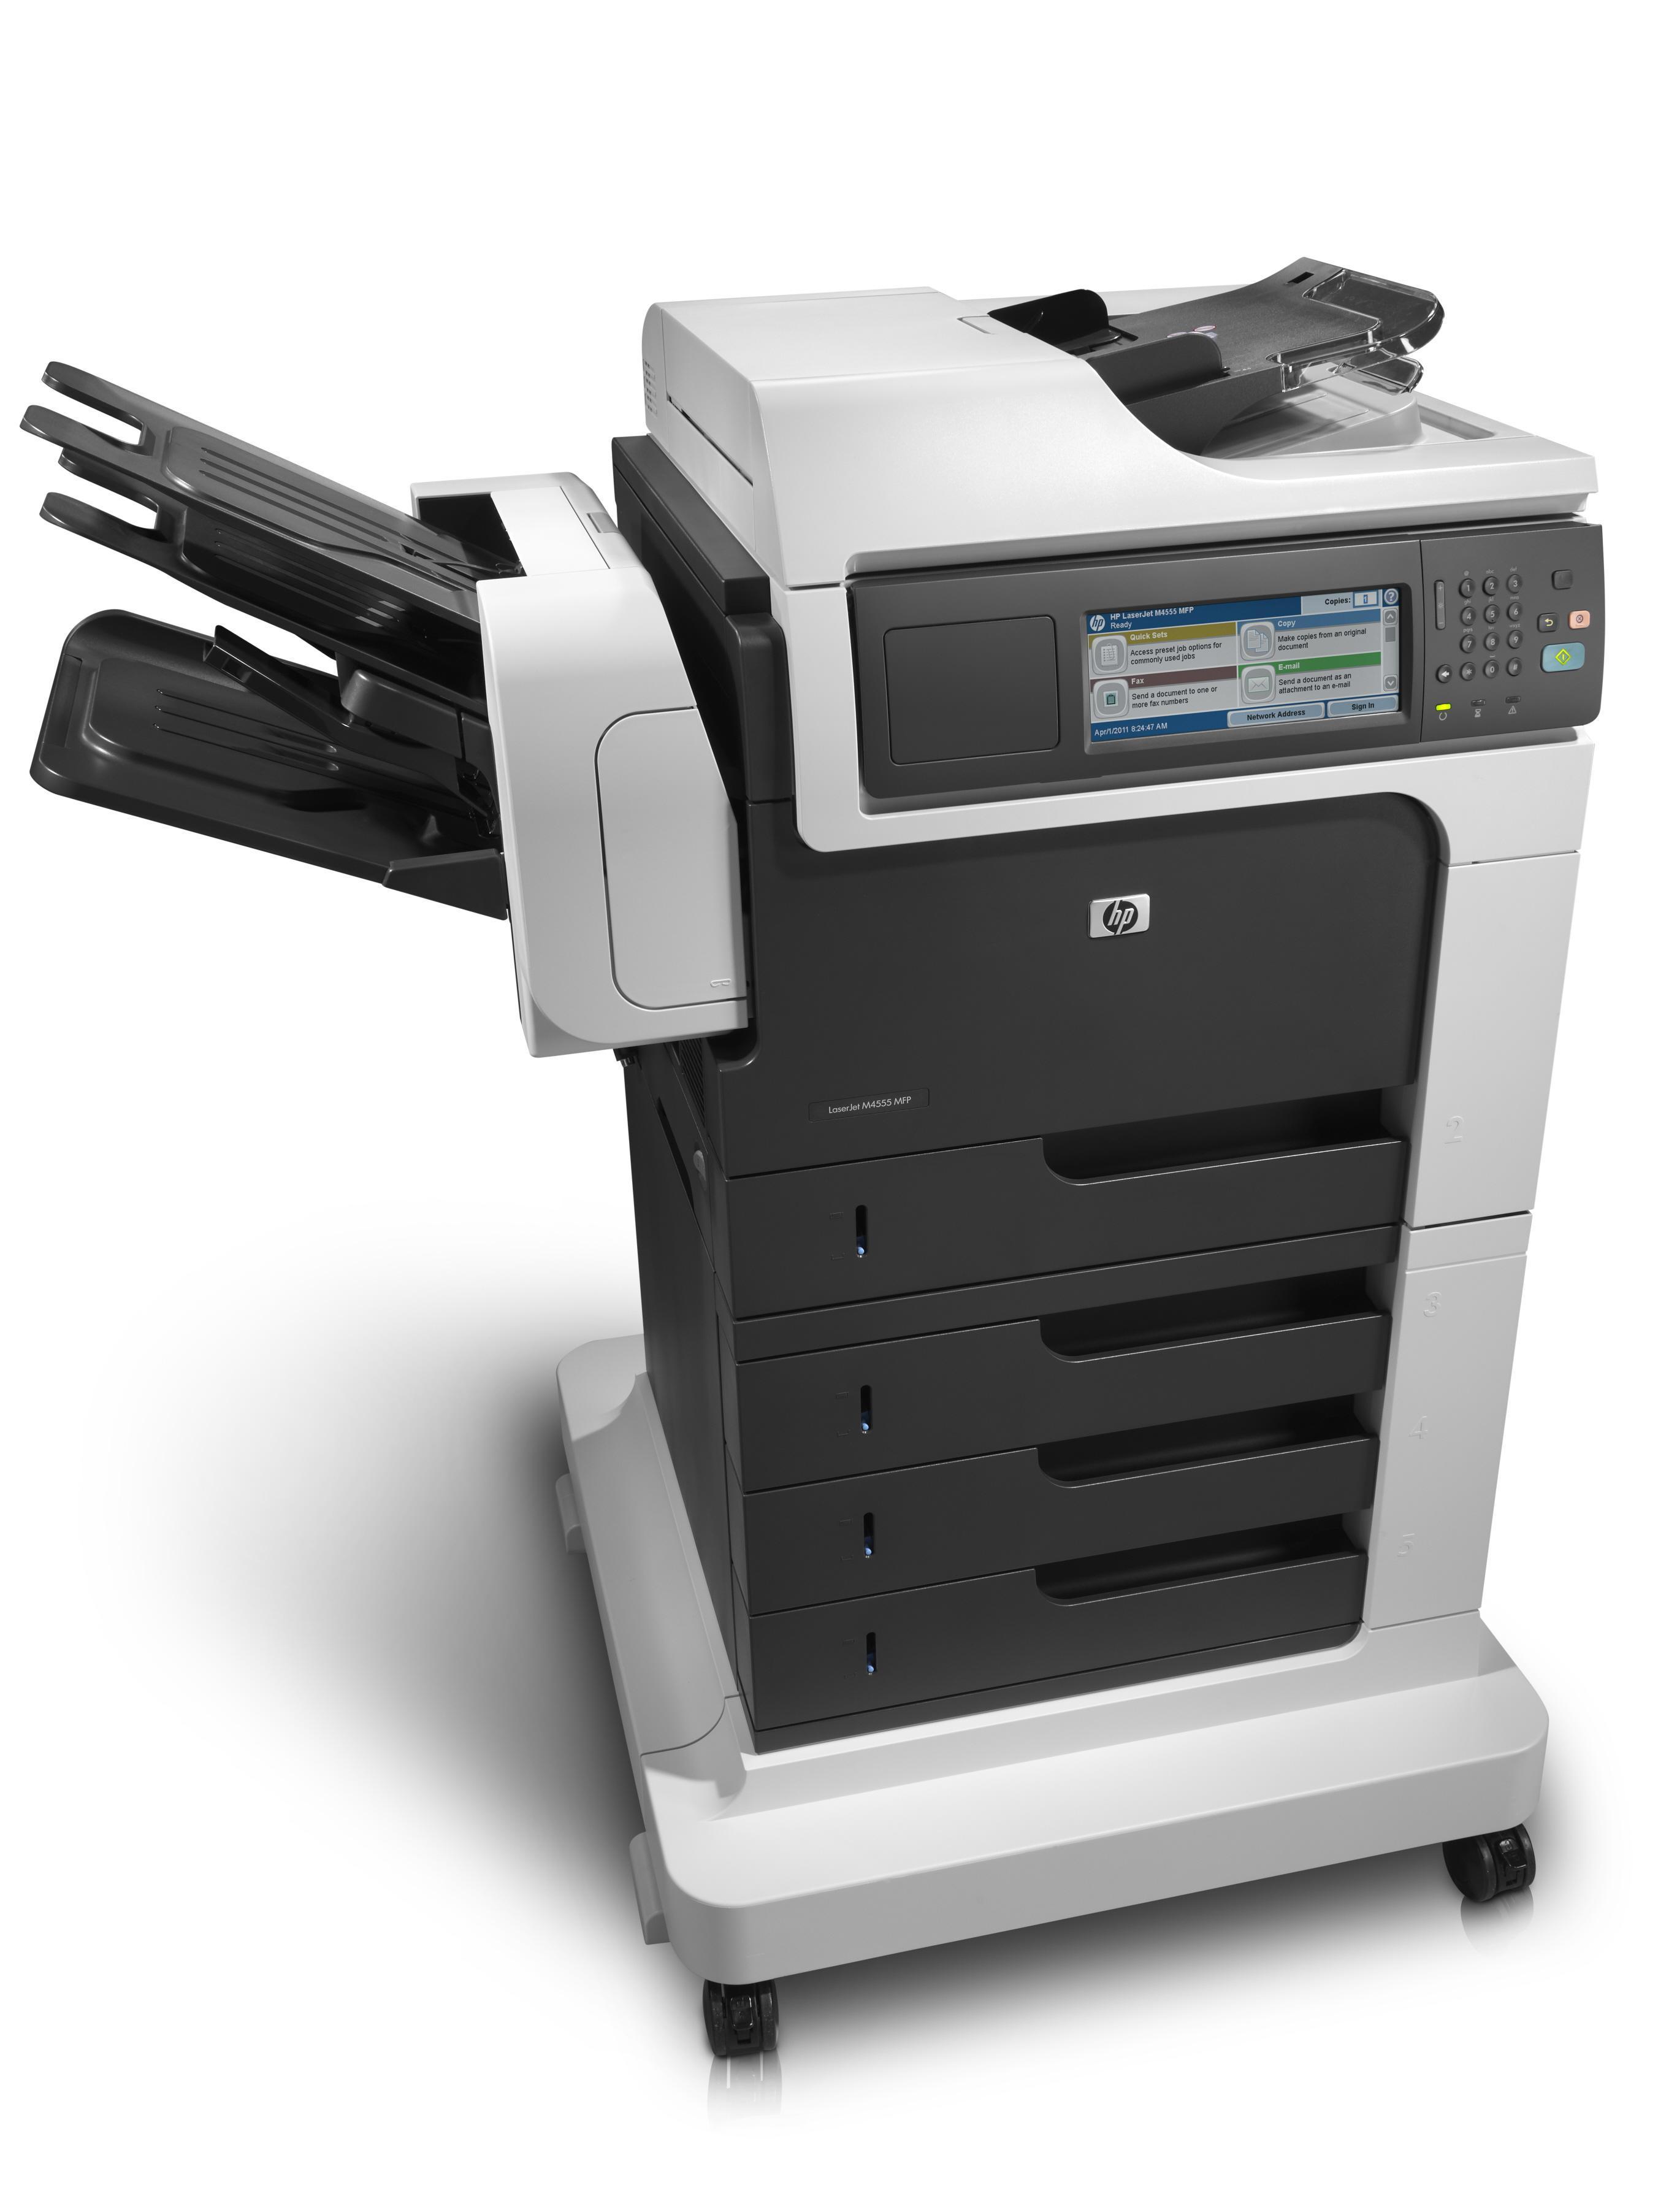 Hp Laserjet Enterprise M4555fskm Mfp Toner Cartridges